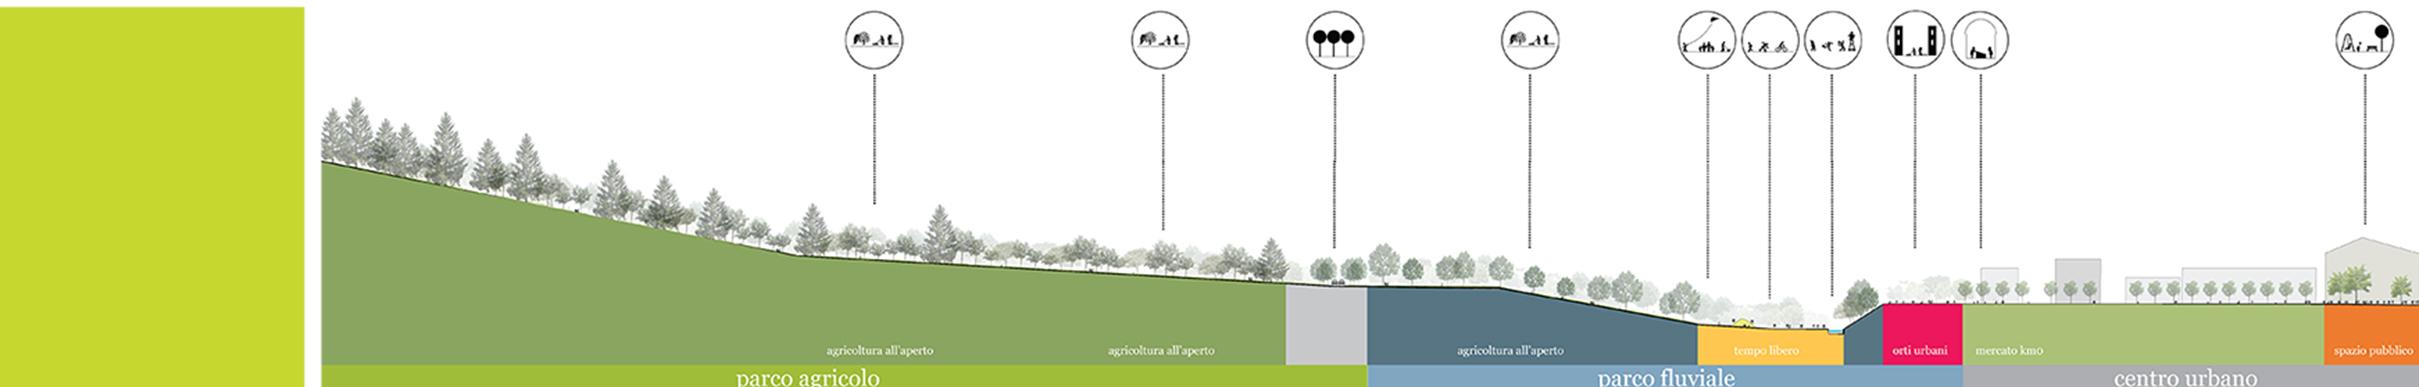 paesaggi 13.jpg